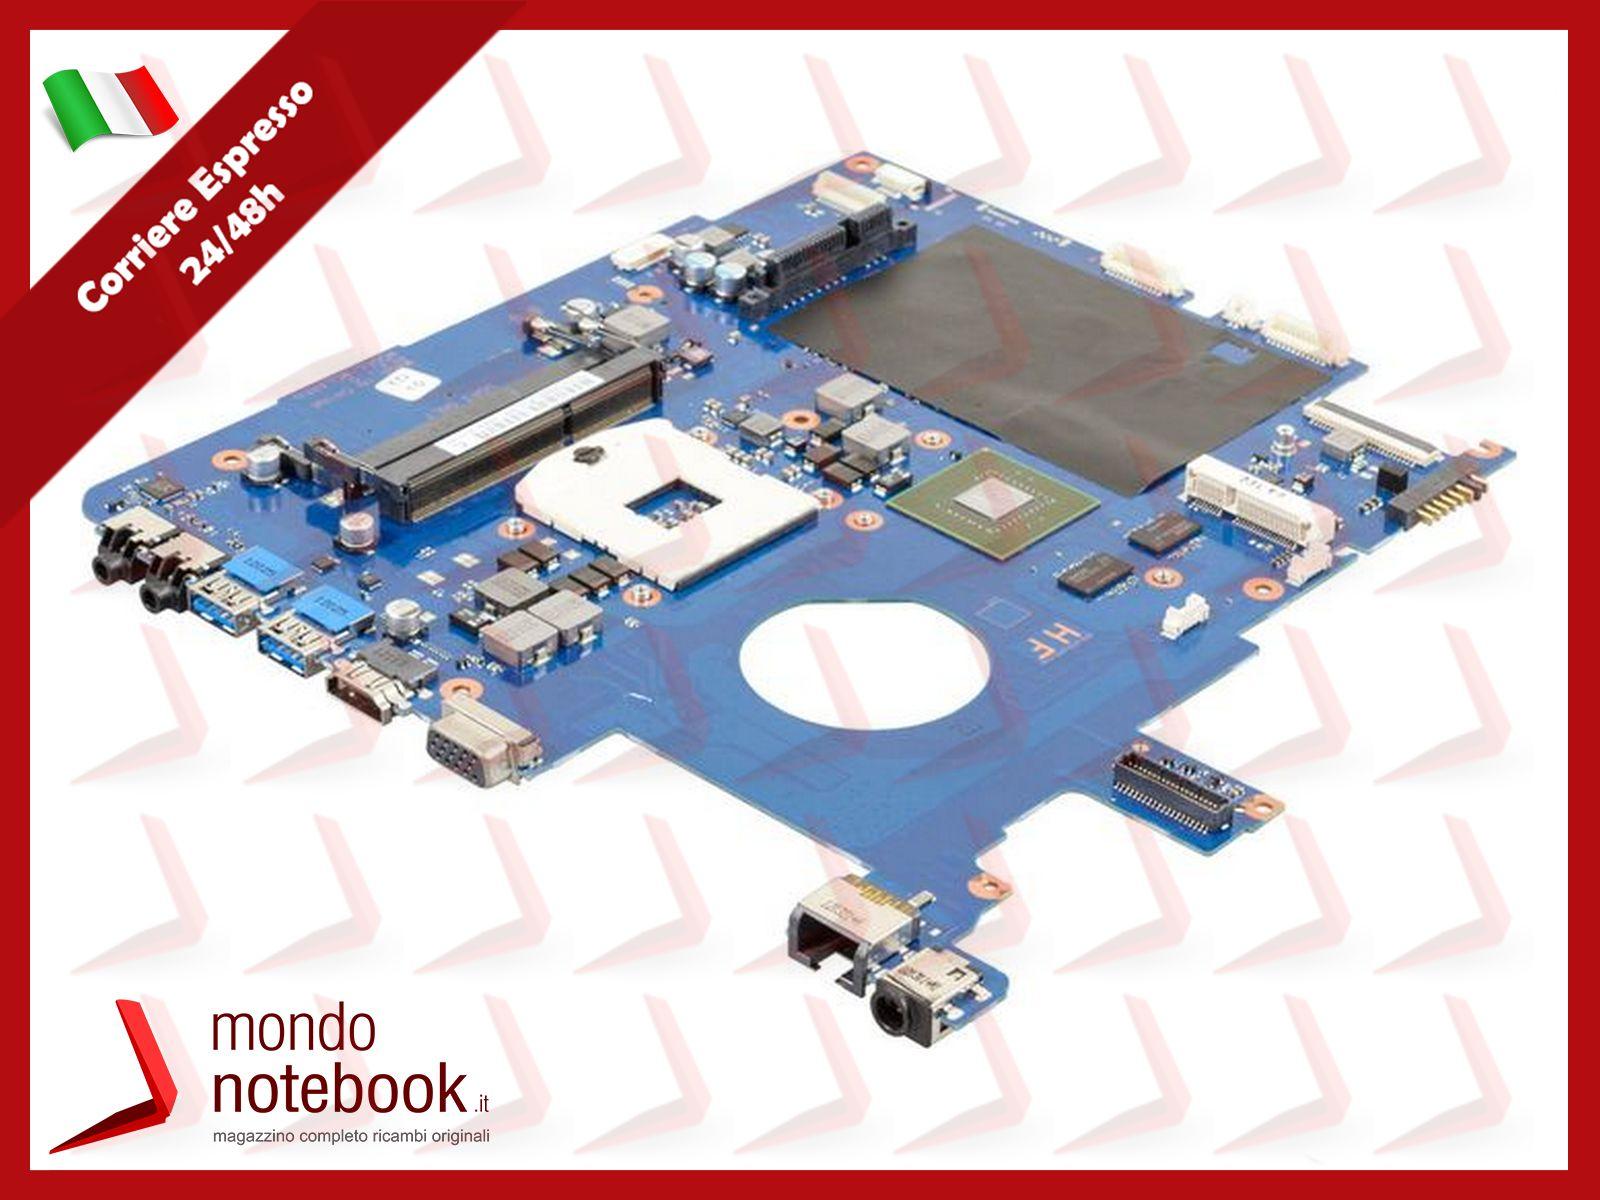 https://www.mondonotebook.it/11171/tastiera-notebook-hp-elitebook-8560w-8570w-con-trackpoint-nera-con-adesivi-layout-ita.jpg